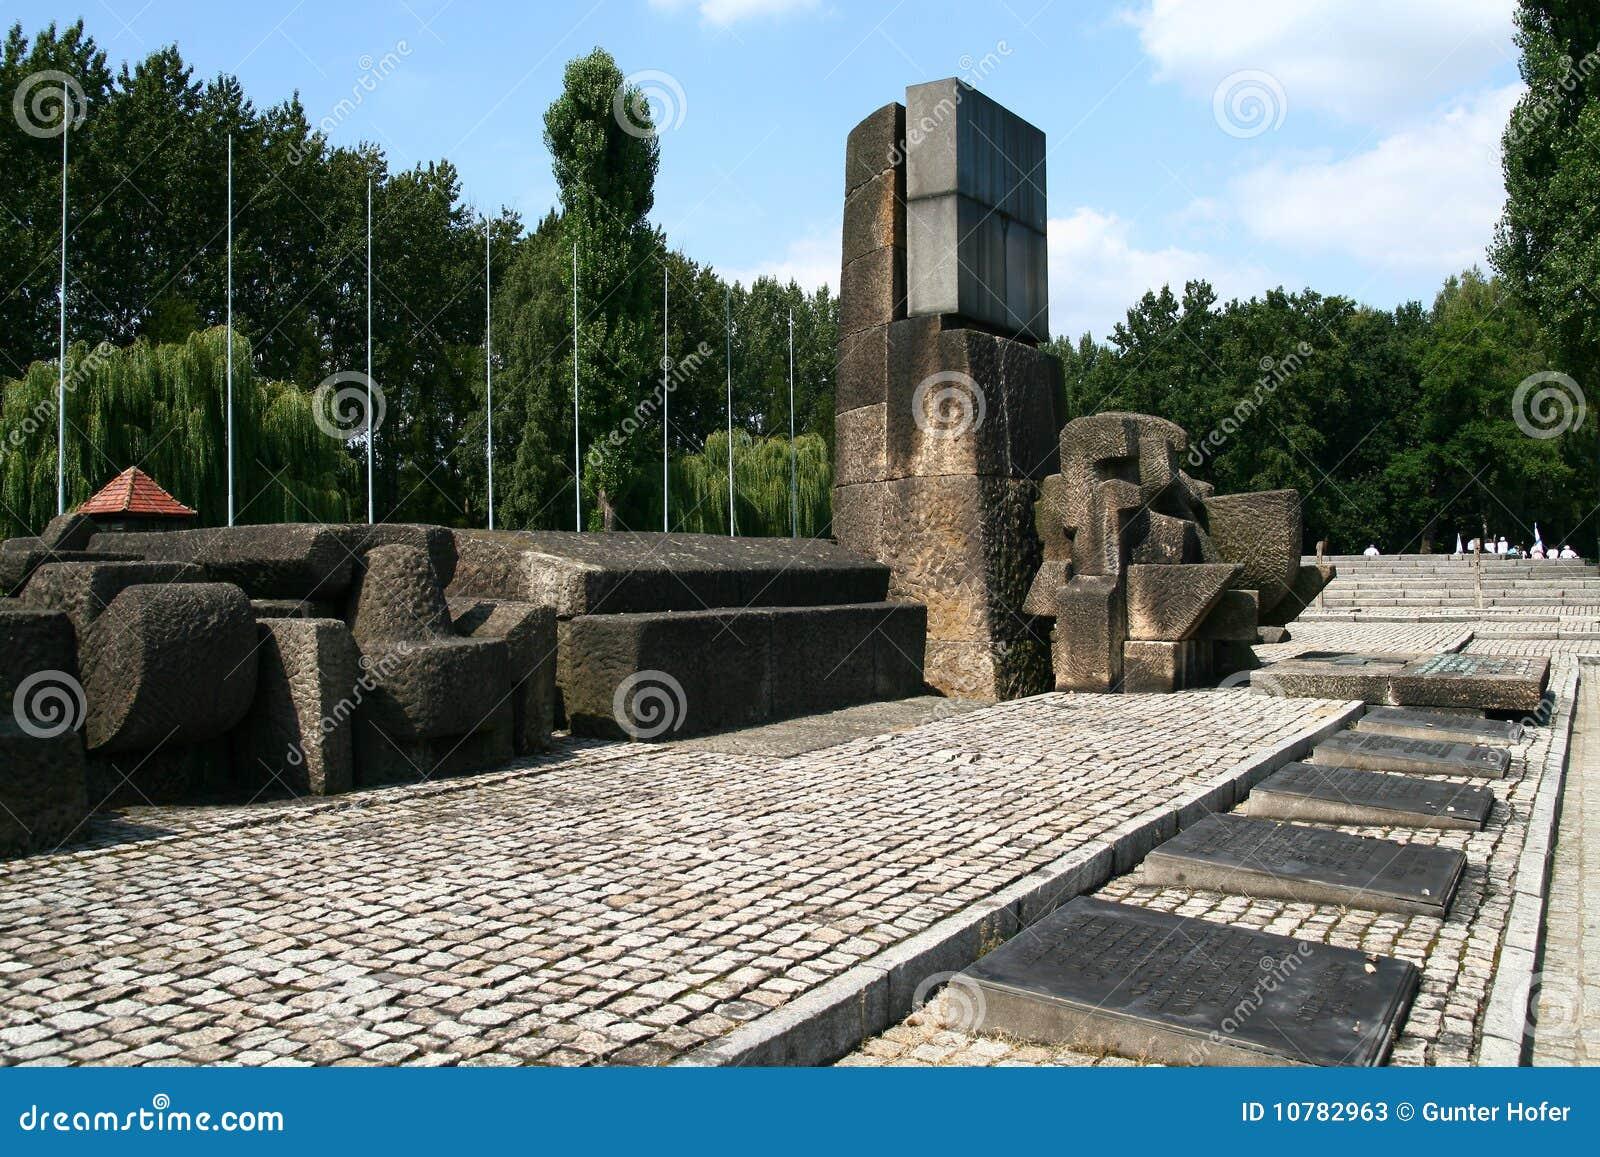 Auschwitz Memorial Site Editorial Stock Photo Image